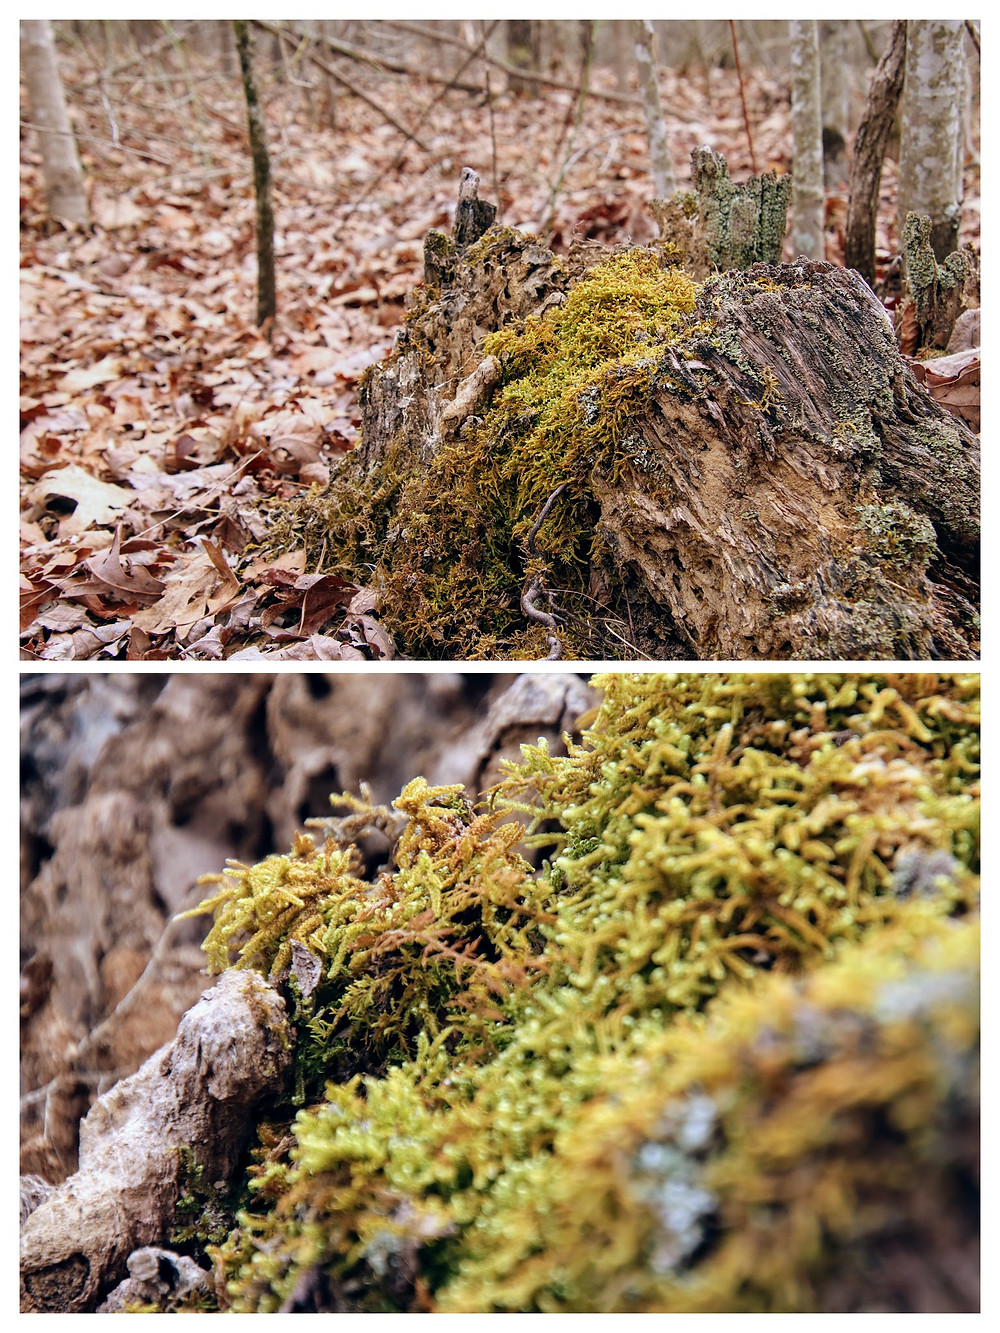 Housed in Tree Stumps